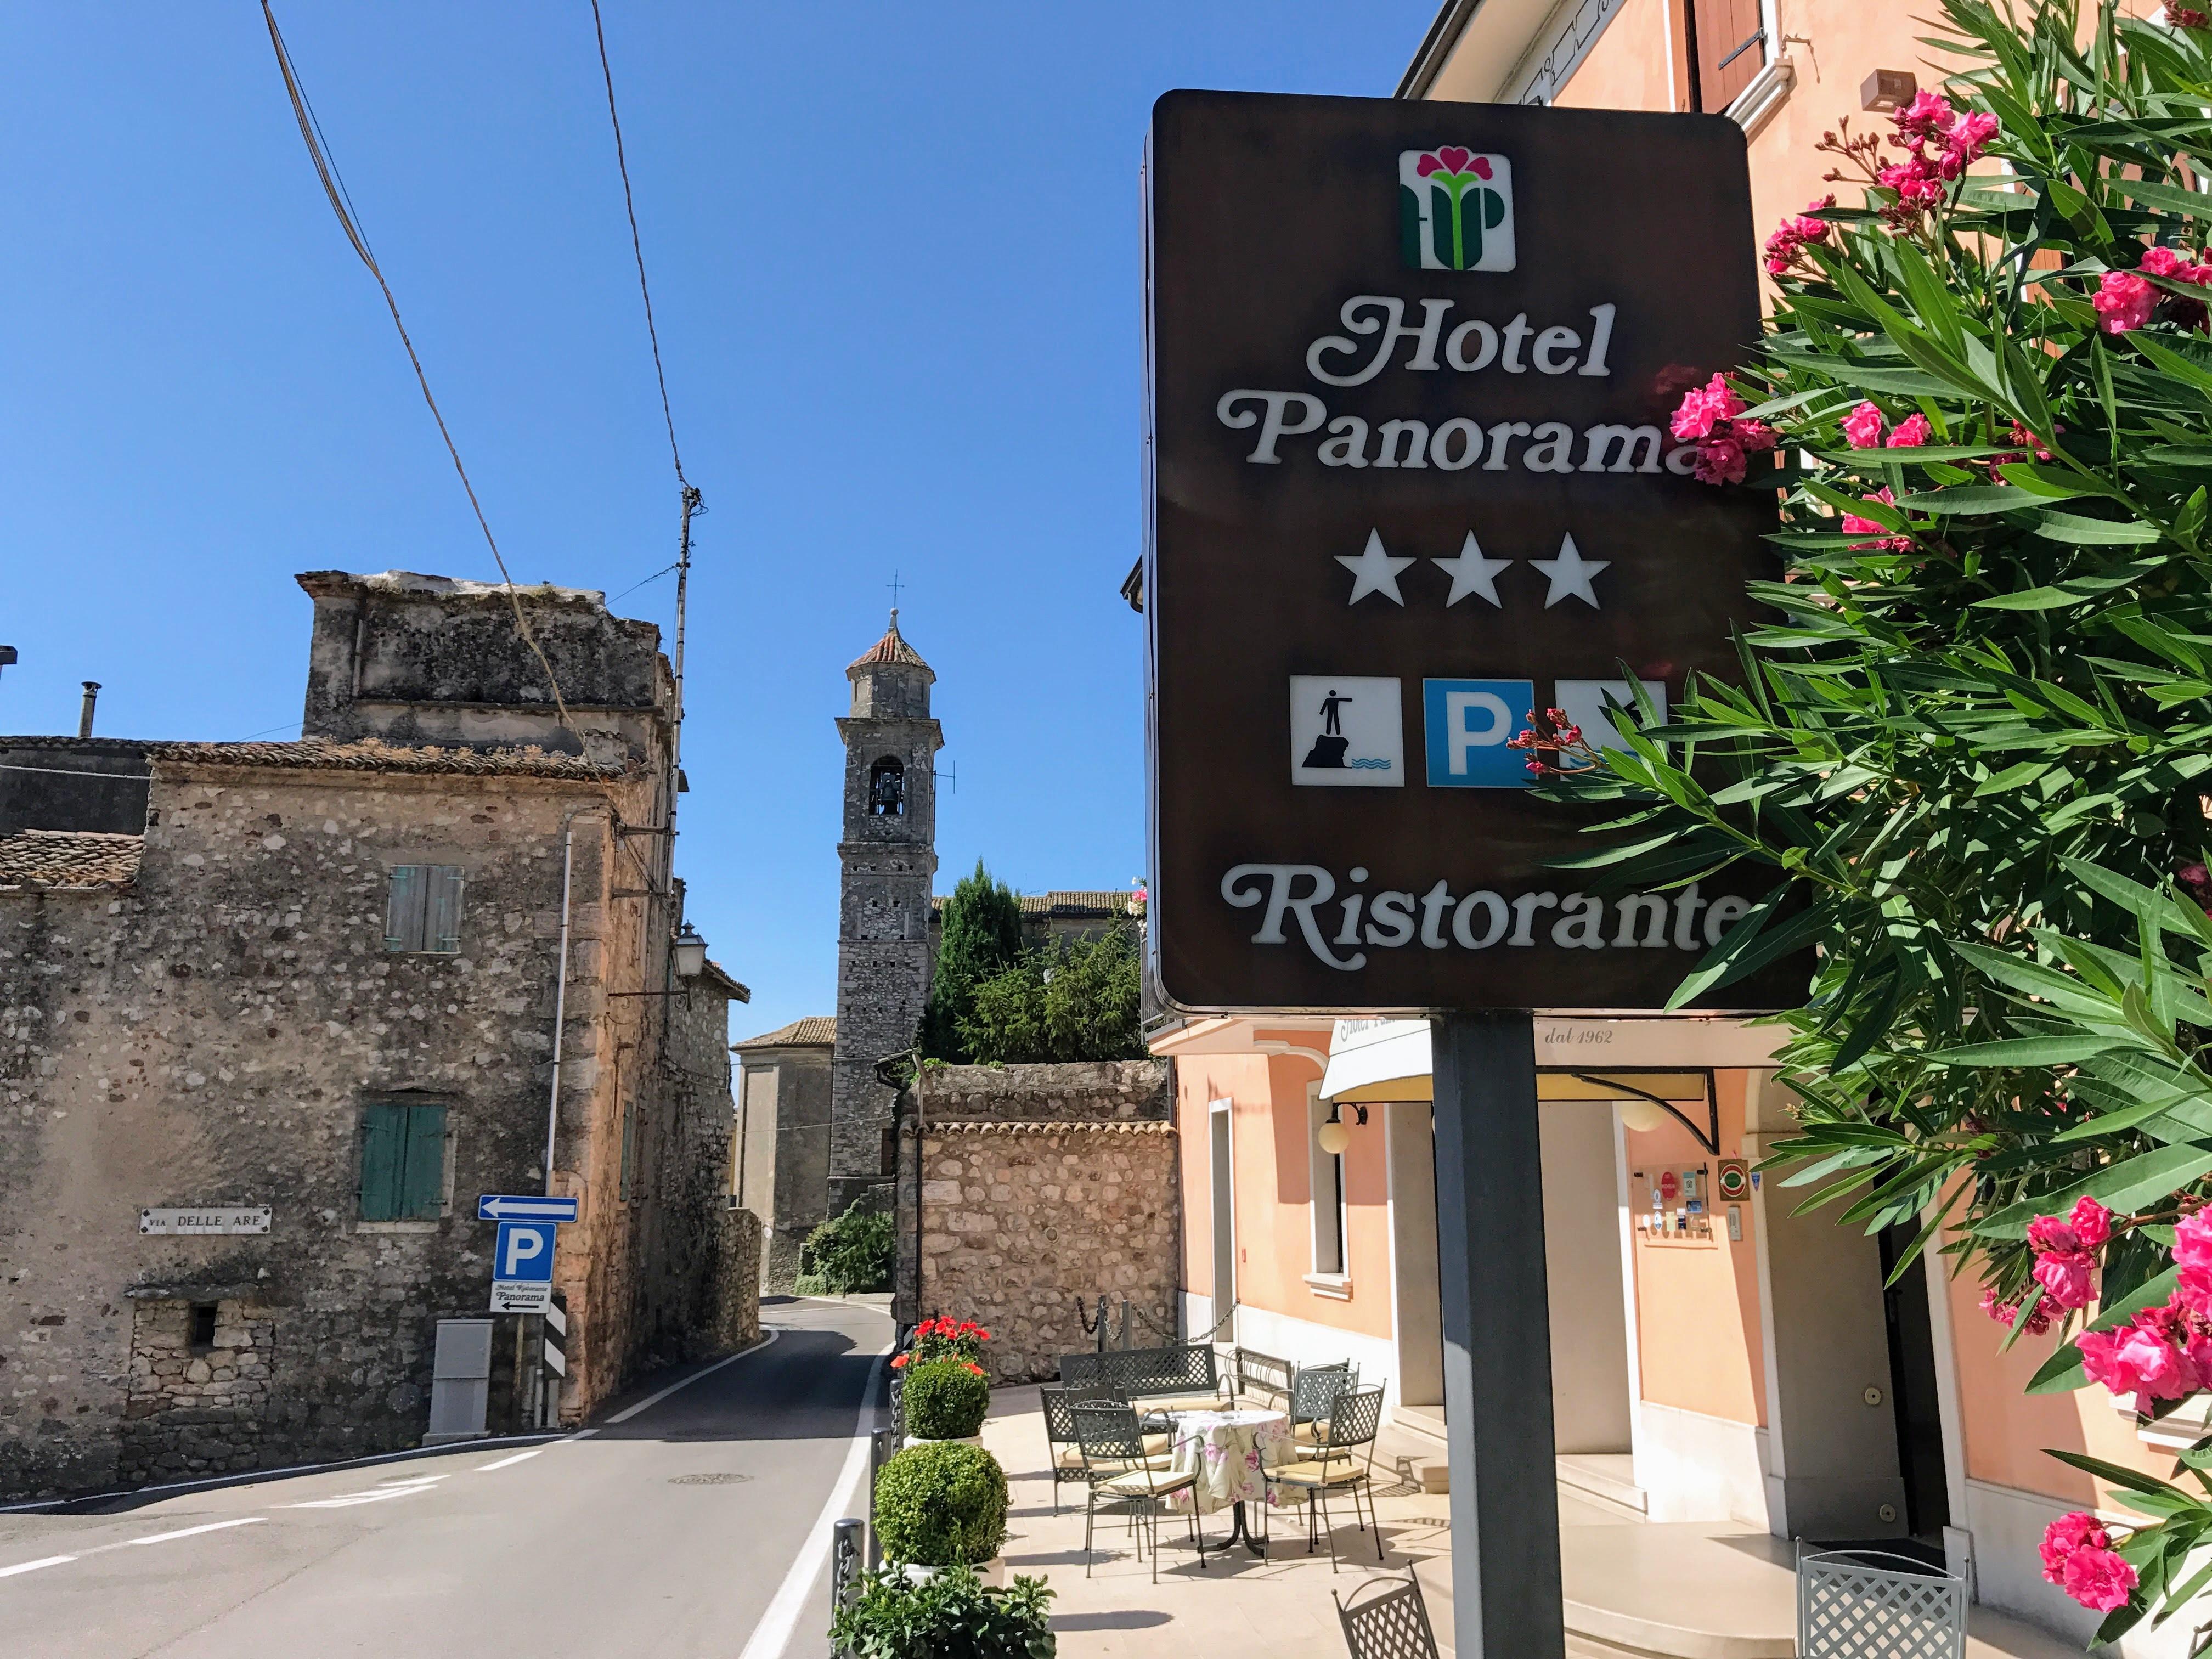 Hotel Panorama Torri del Benaco Albisano